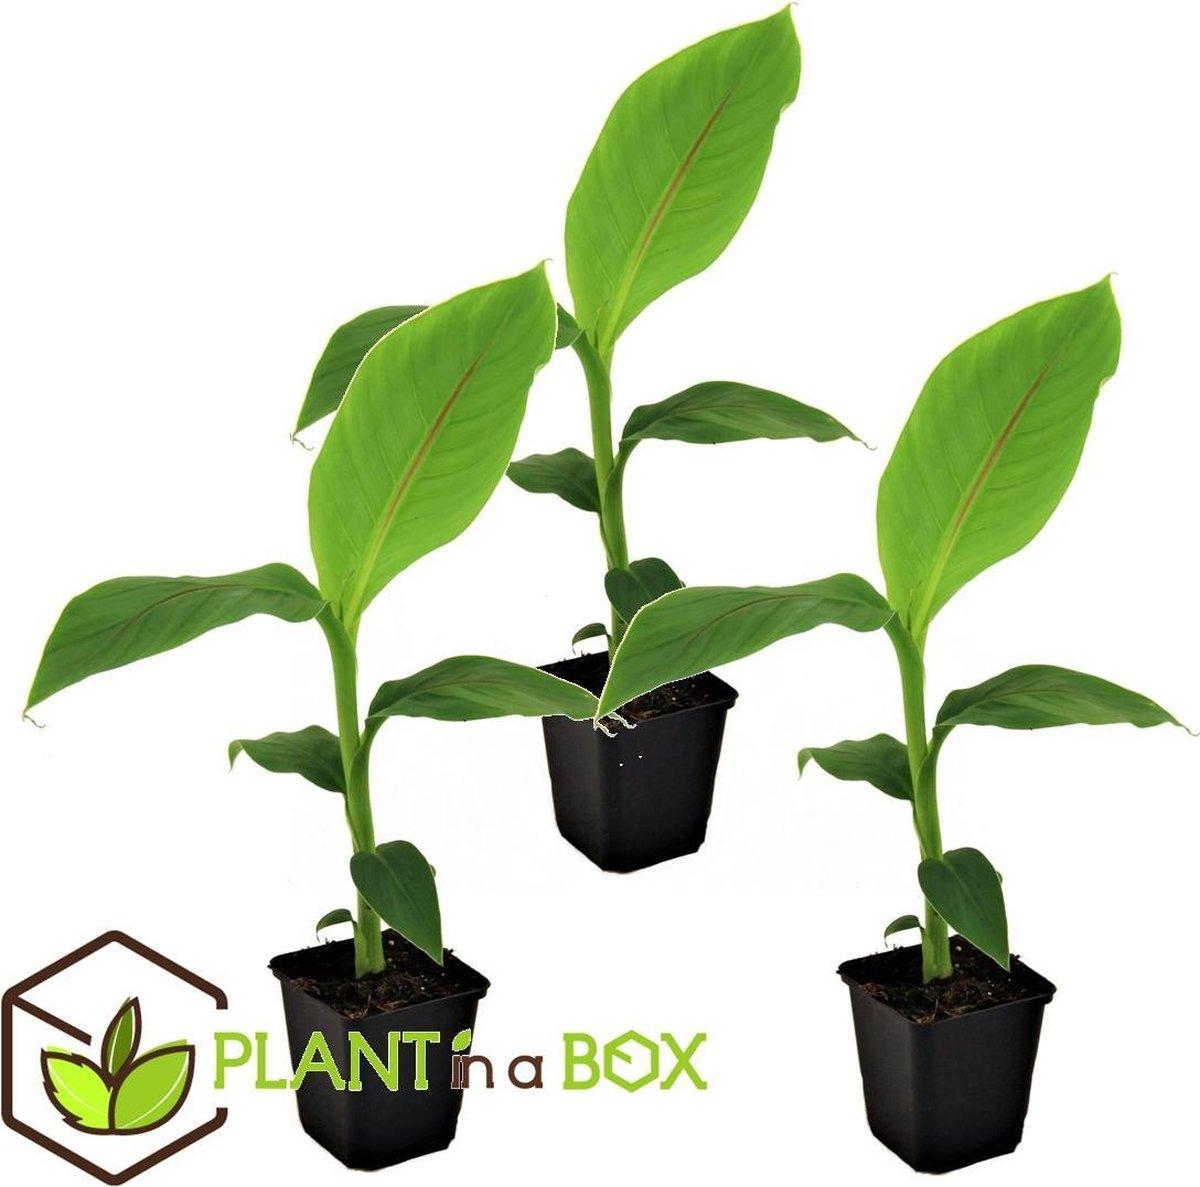 Plant in a Box - Set van 3 Musa Basjoo - winterharde bananenplanten - Pot   9cm -Hoogte   20-25cm